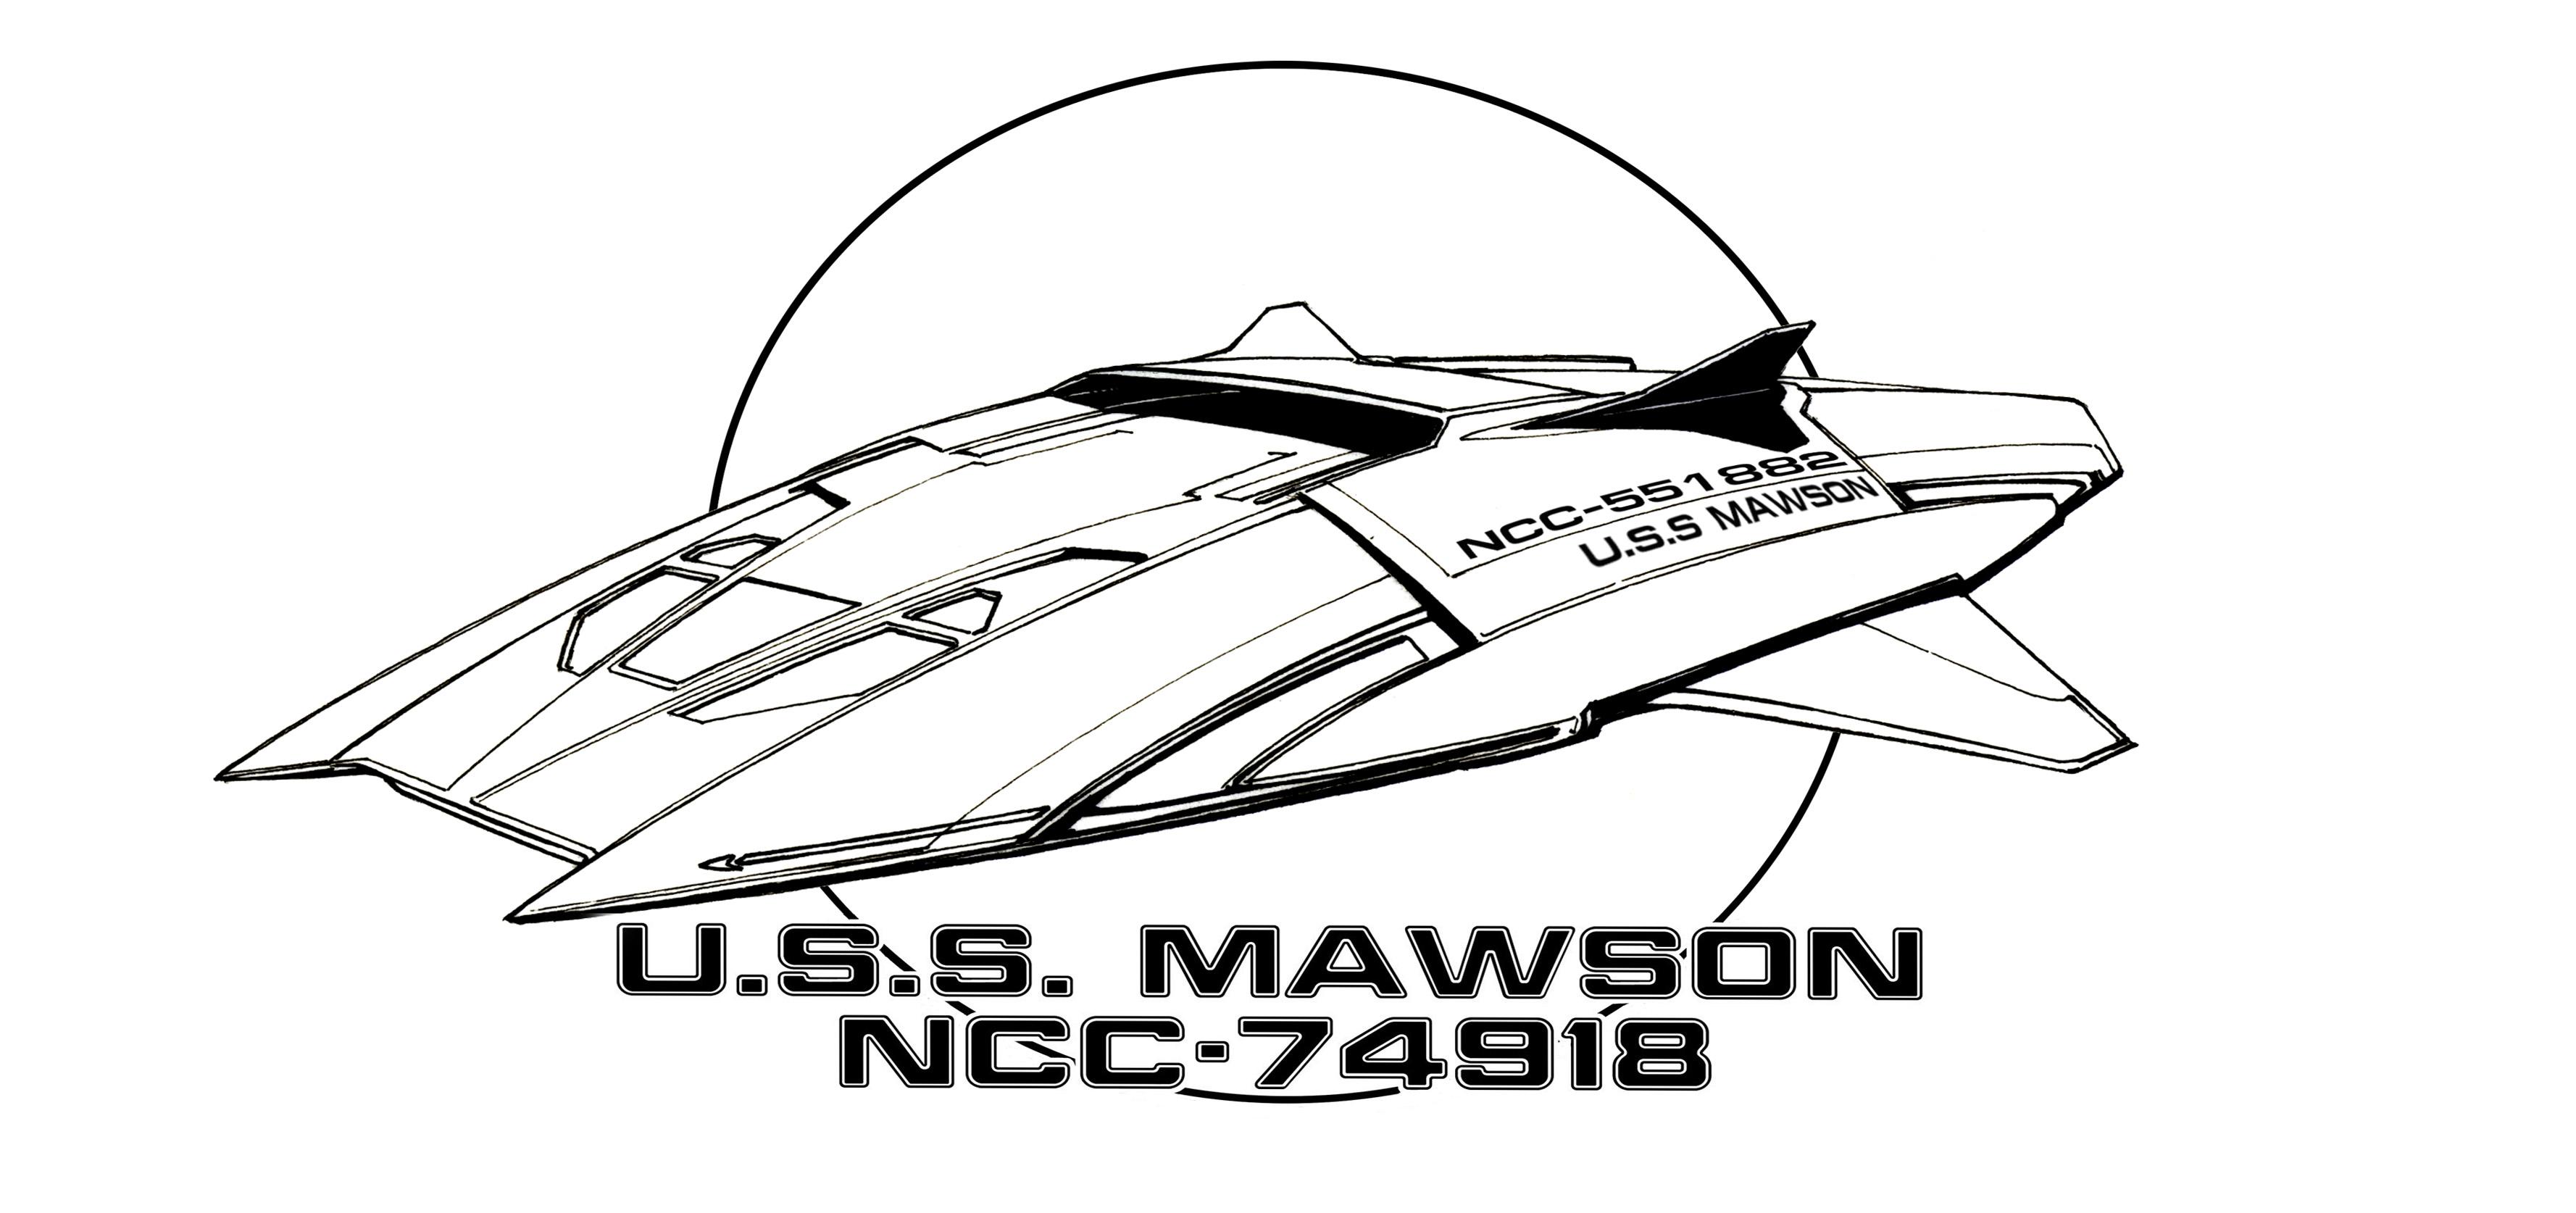 The Starships Of Perpetual Star Trek Online